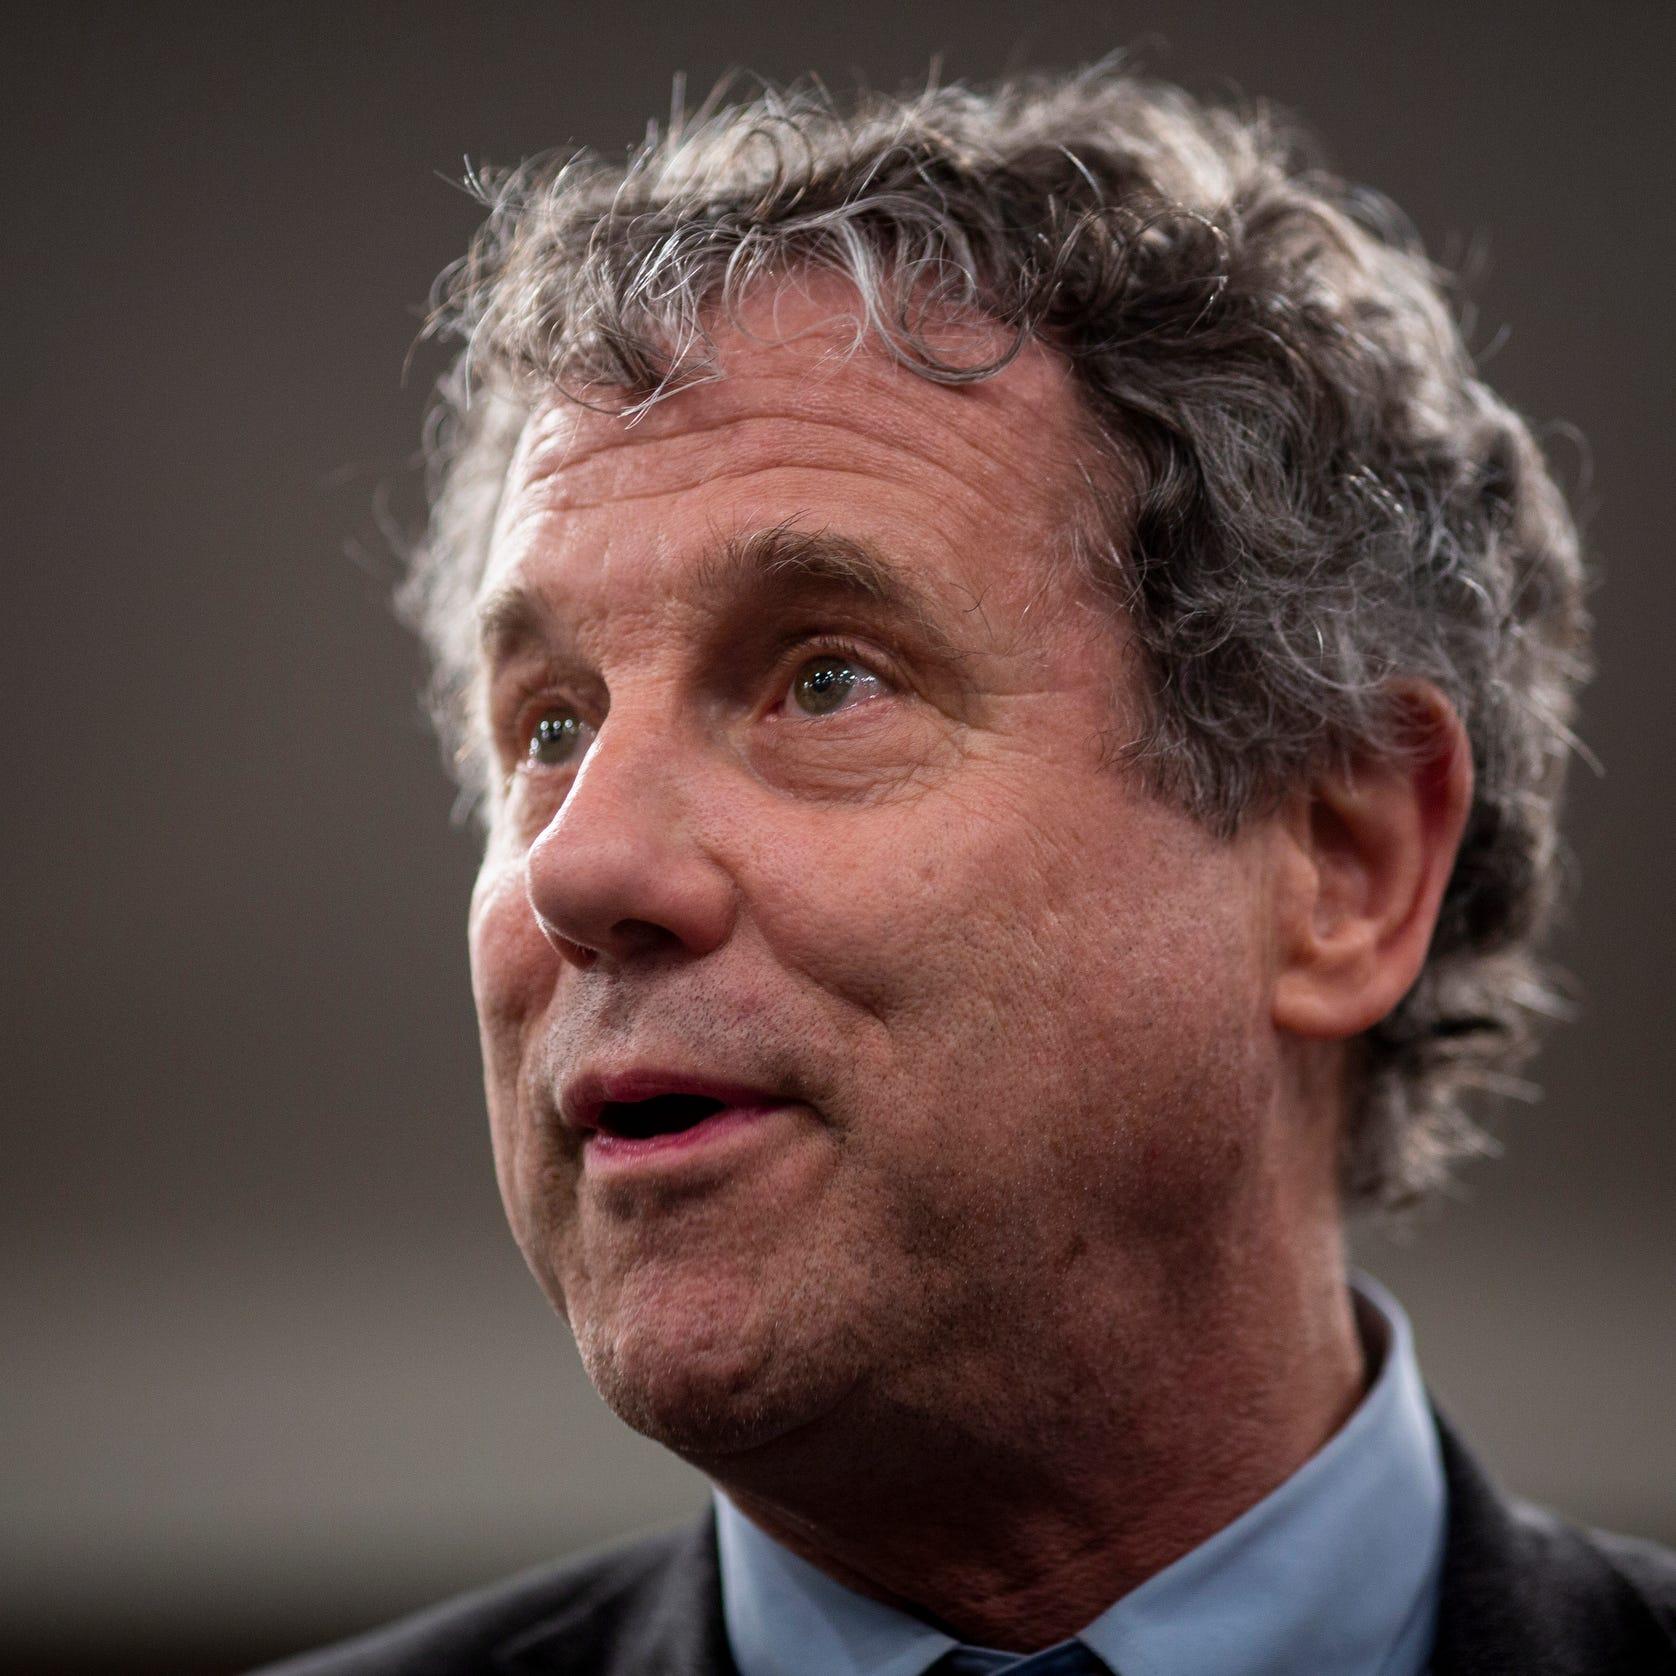 Sherrod Brown won't run for president. The Ohio Democrat said he wants to remain a senator